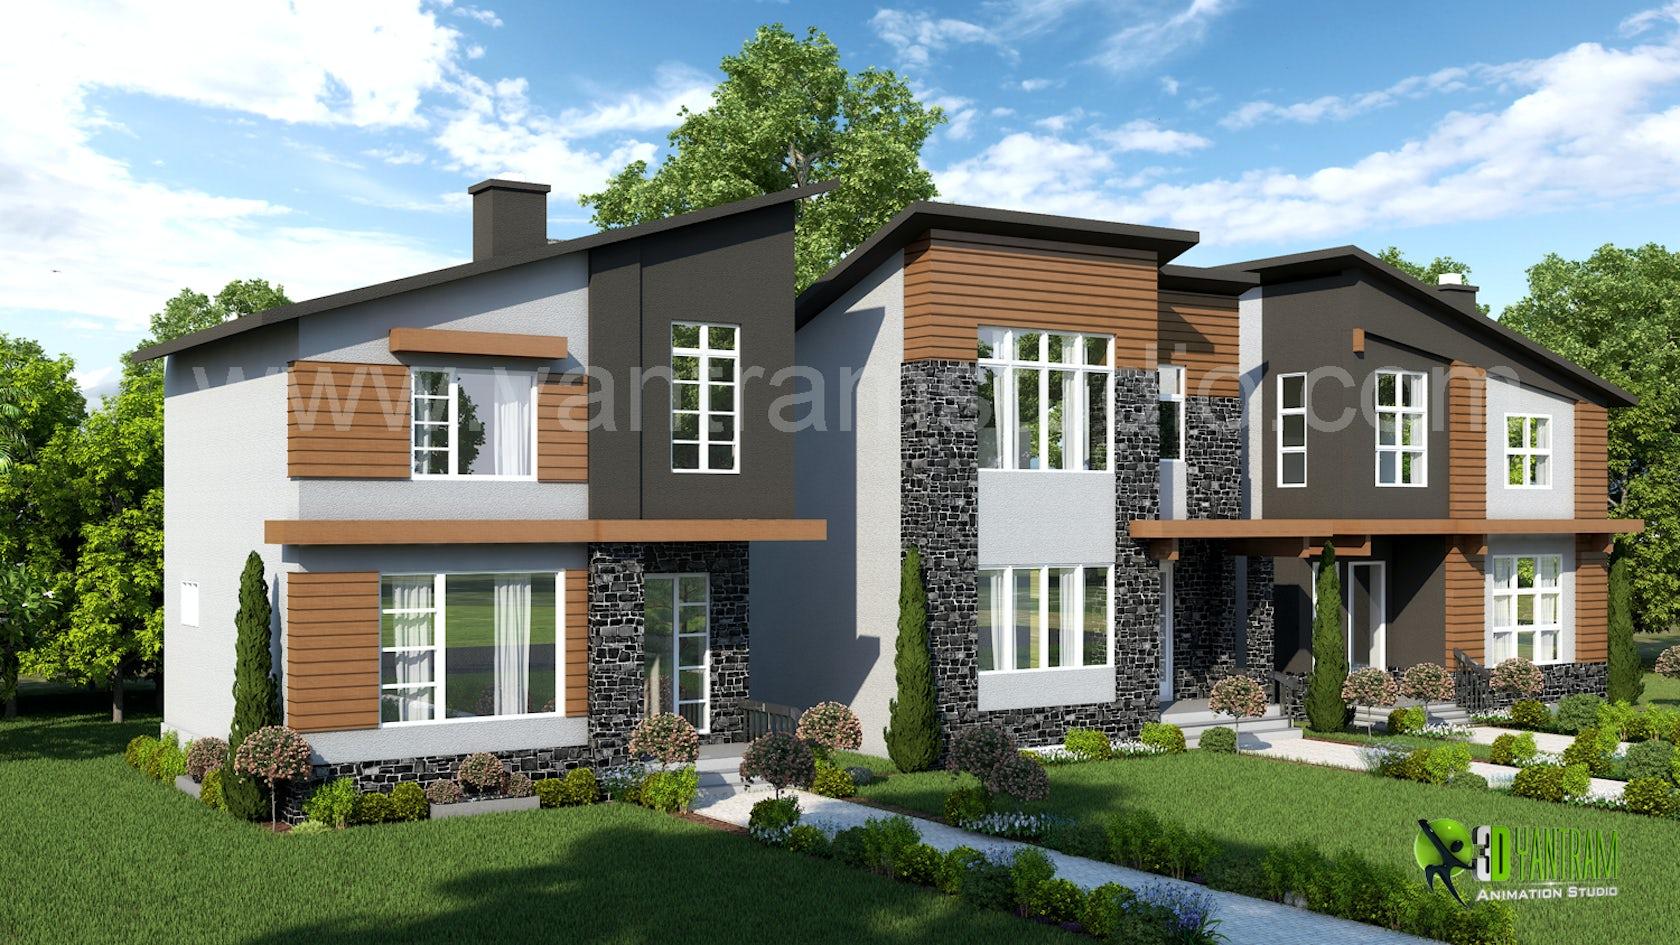 3d exterior residential rendering design architizer for Exterior 3d rendering